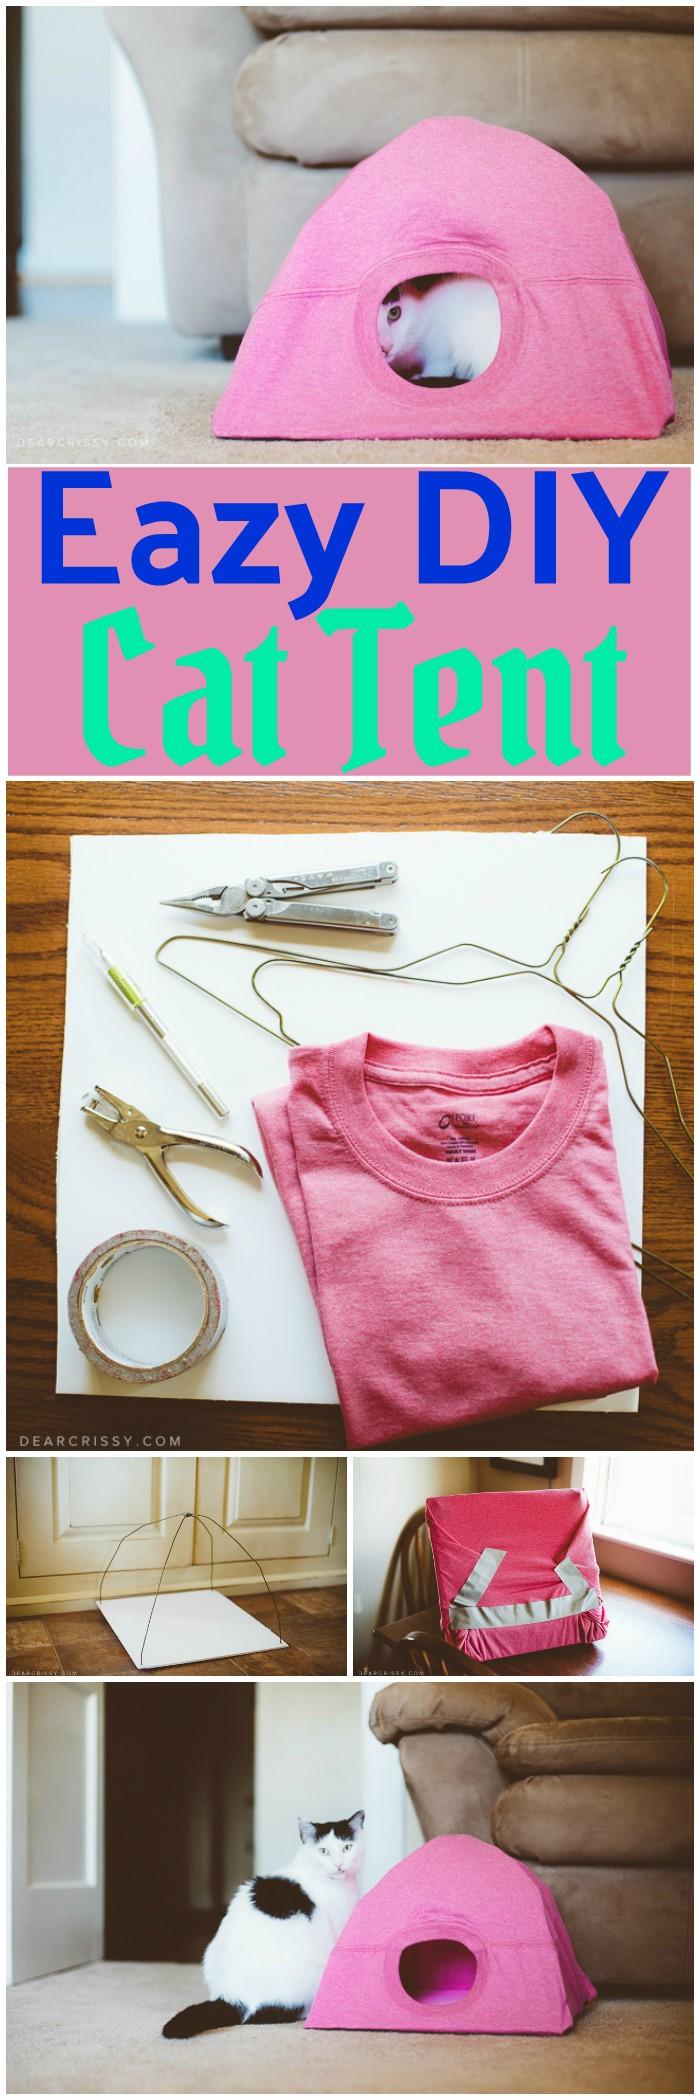 DIY Cat Tent DIY Dollar Store crafts & Decorating ideas